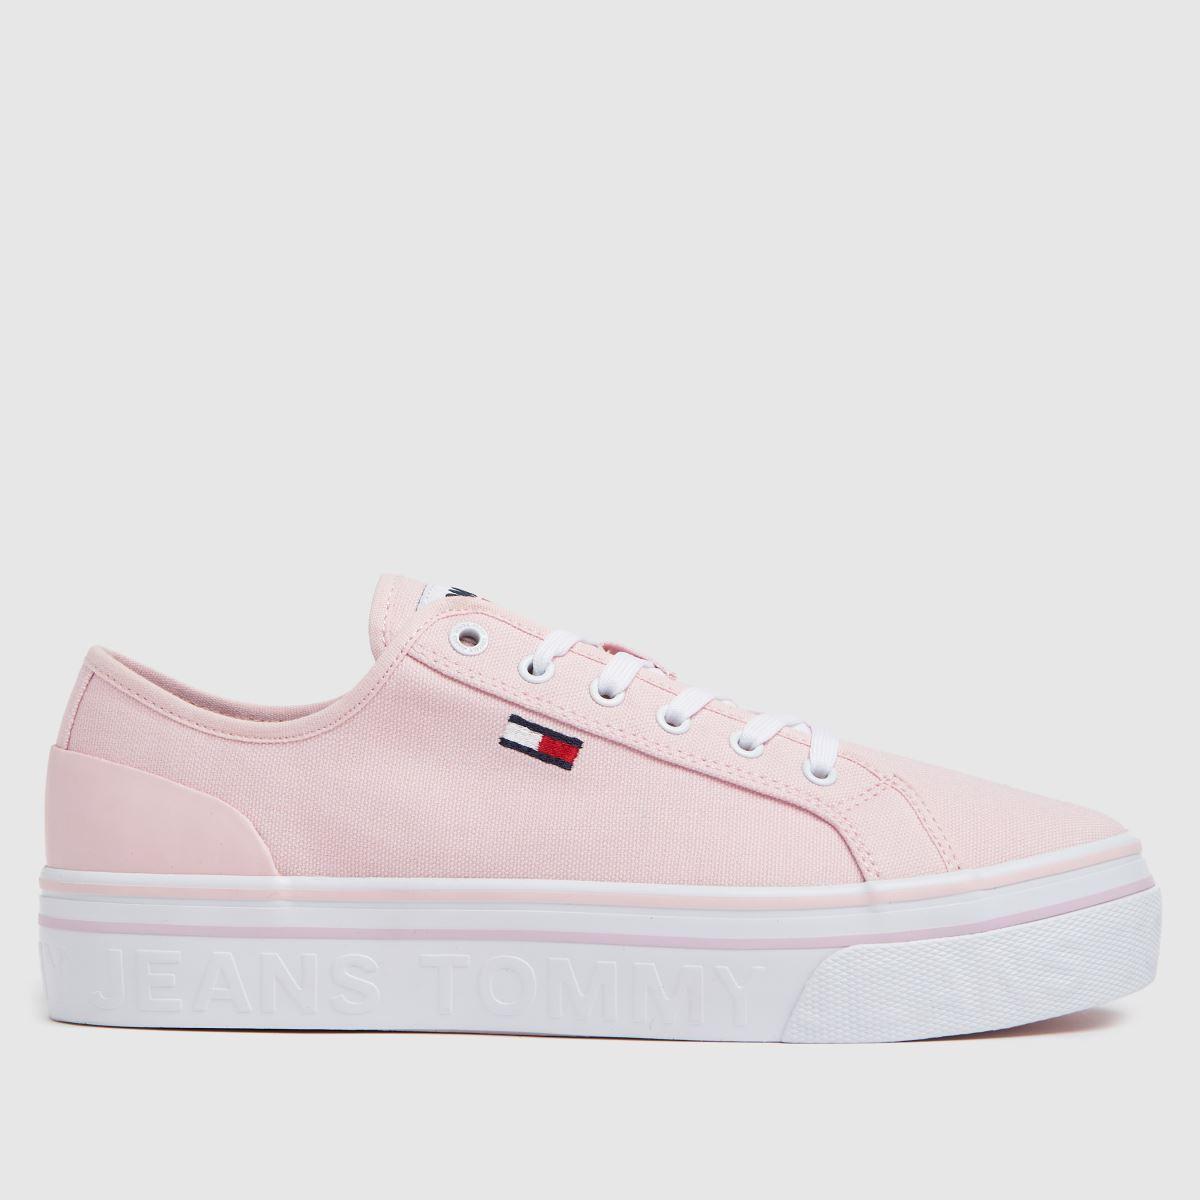 Tommy Hilfiger Pale Pink Flatform Vulc Trainers